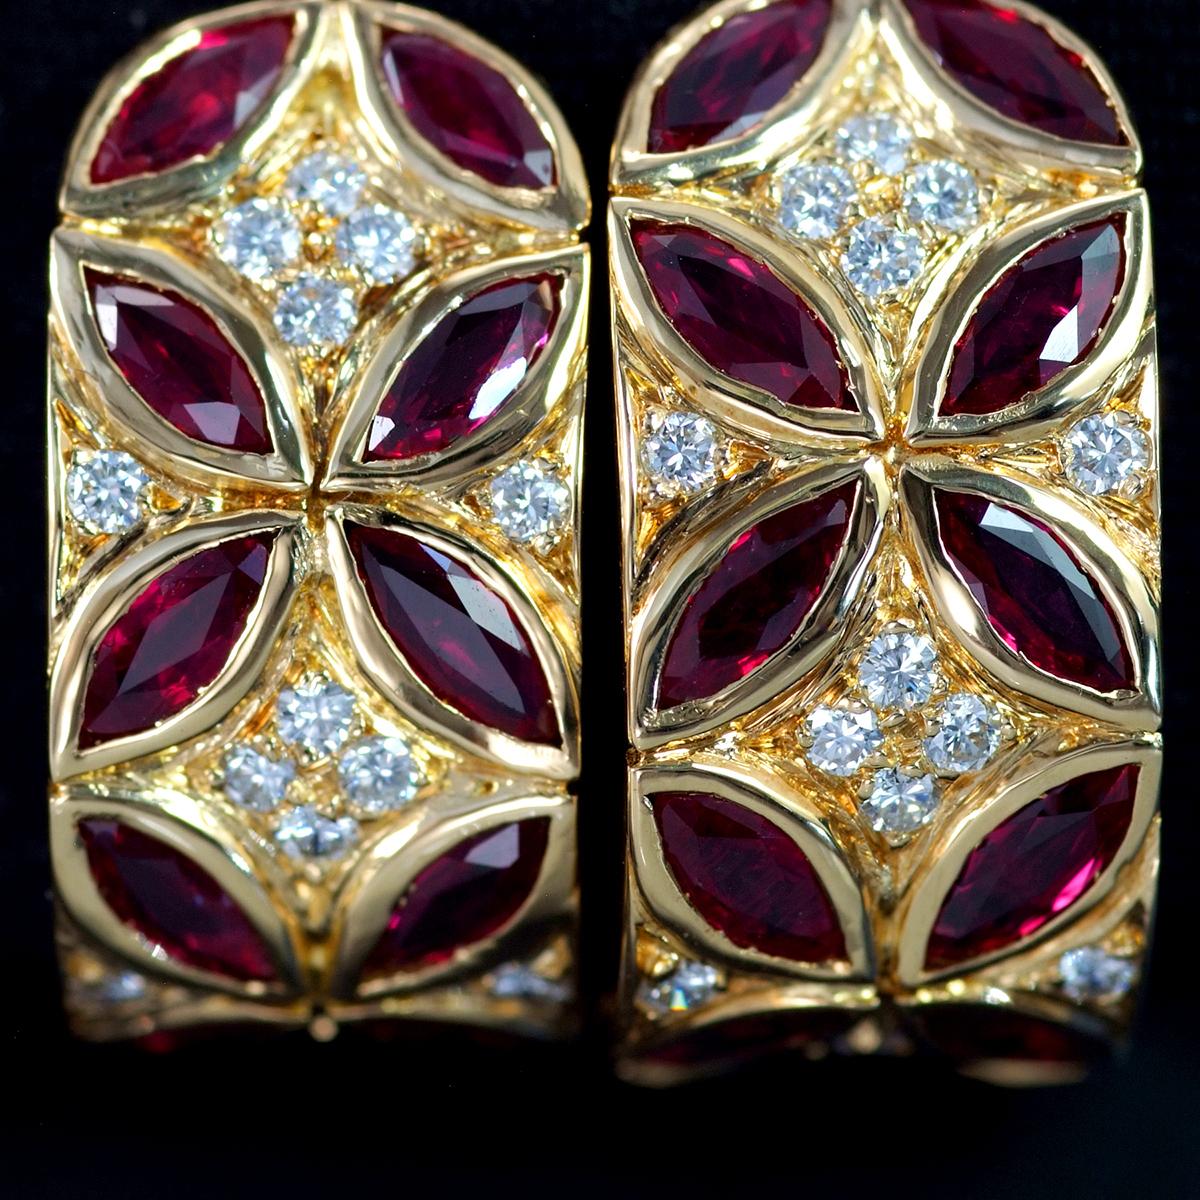 F2219【Dior】ディオール ルビー 絶品ダイヤモンド 最高級18金無垢セレブリティイヤリング 総重量13.5g 幅22.9×10.6mm_画像2